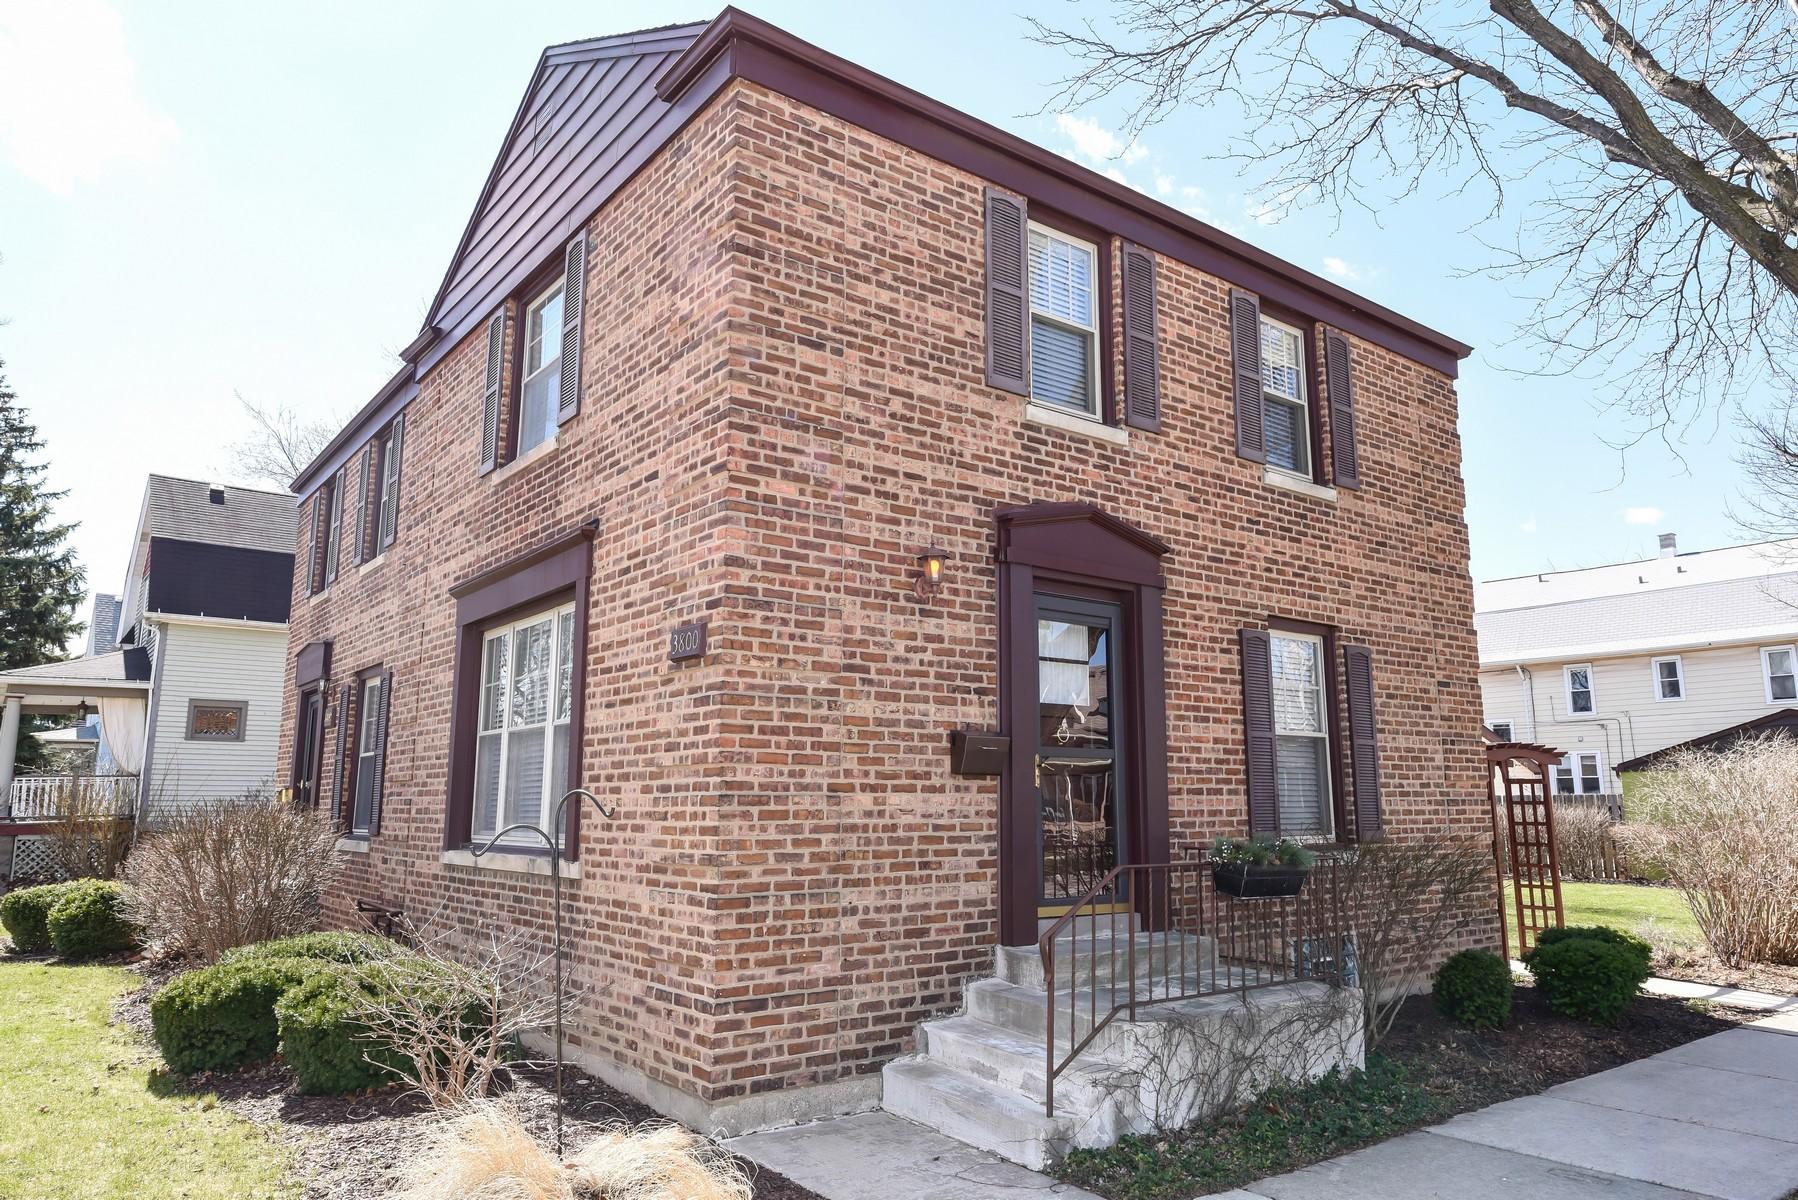 3800 Elm Ave, Brookfield, IL 60513